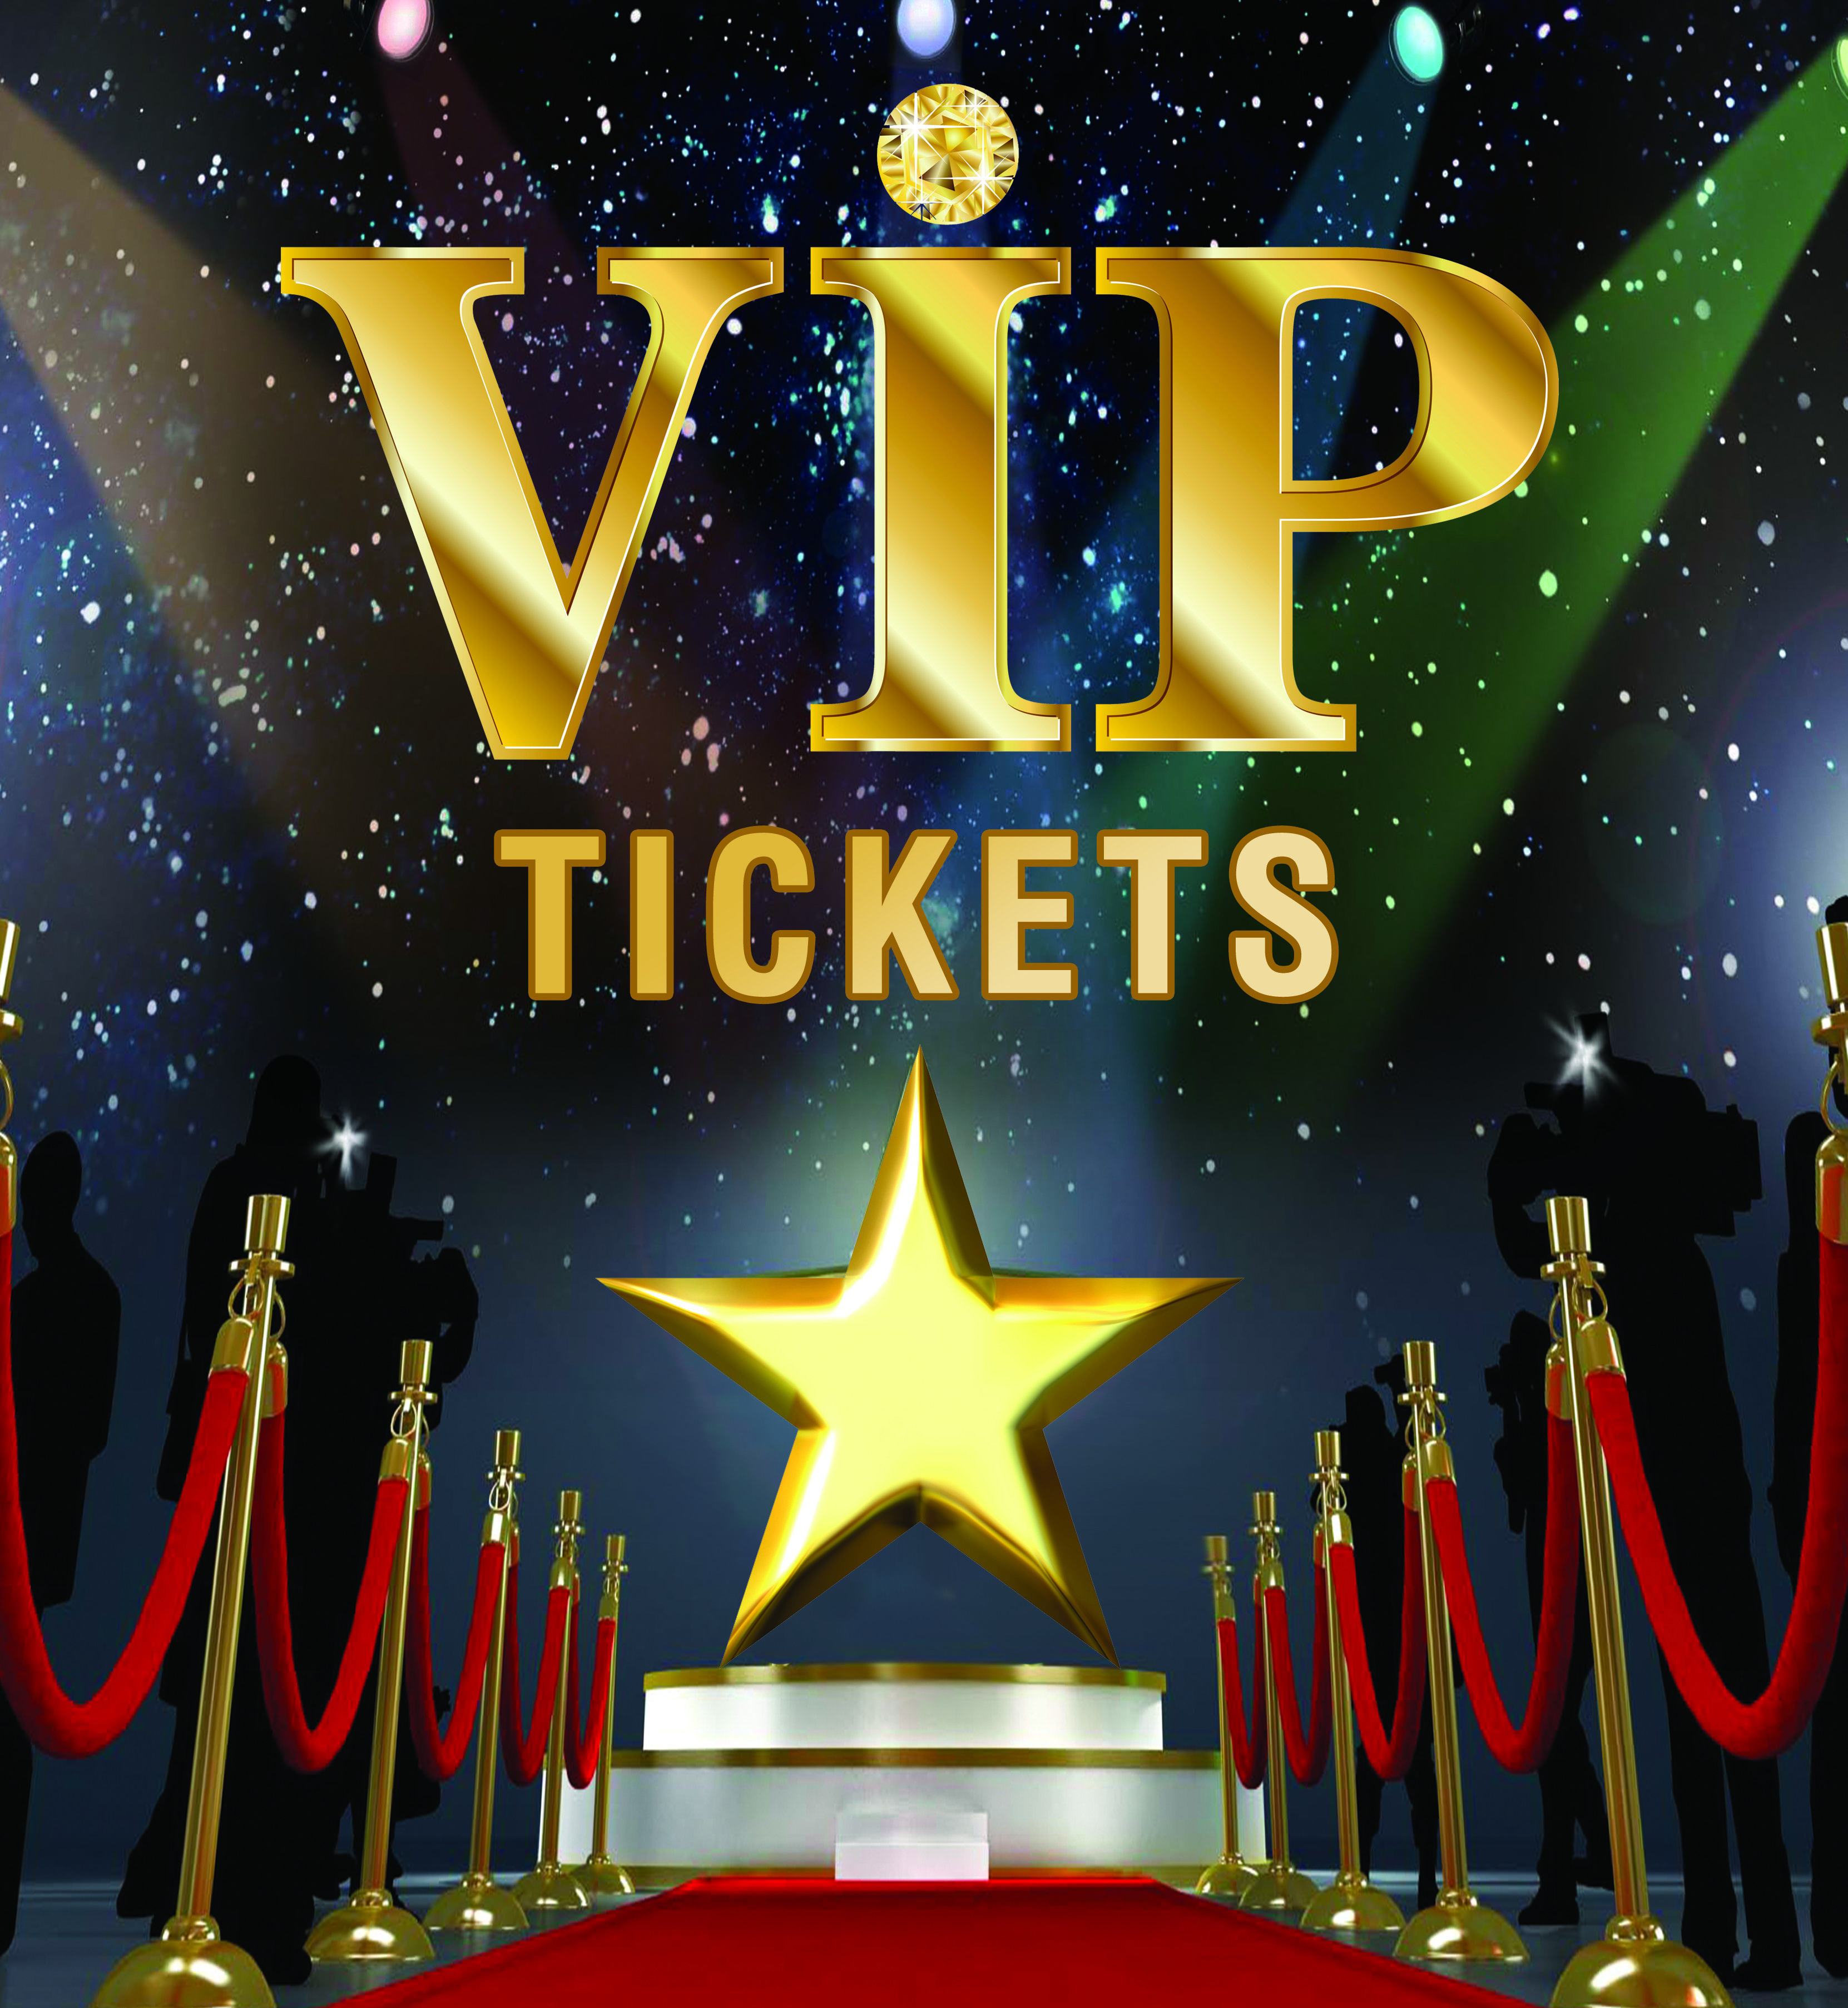 VIP Ticket 00014